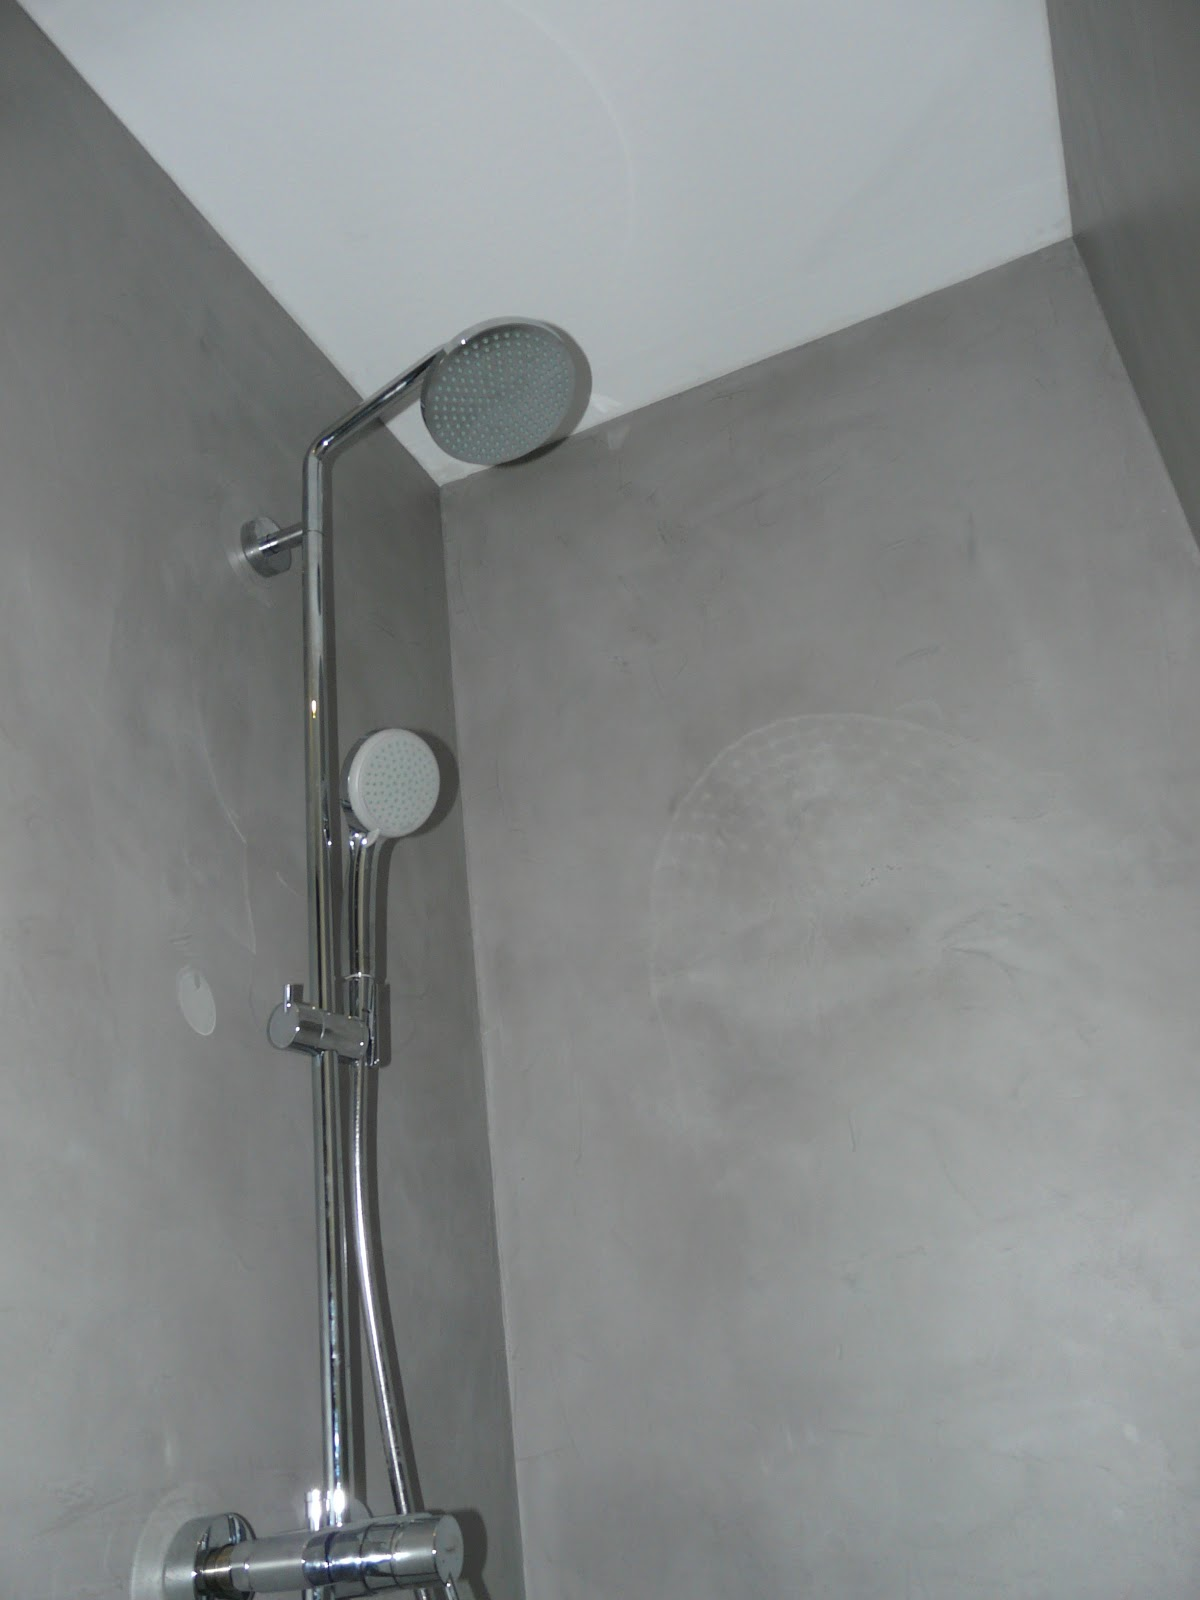 wand wohndesign beton cire beton cir bad in betonoptik. Black Bedroom Furniture Sets. Home Design Ideas